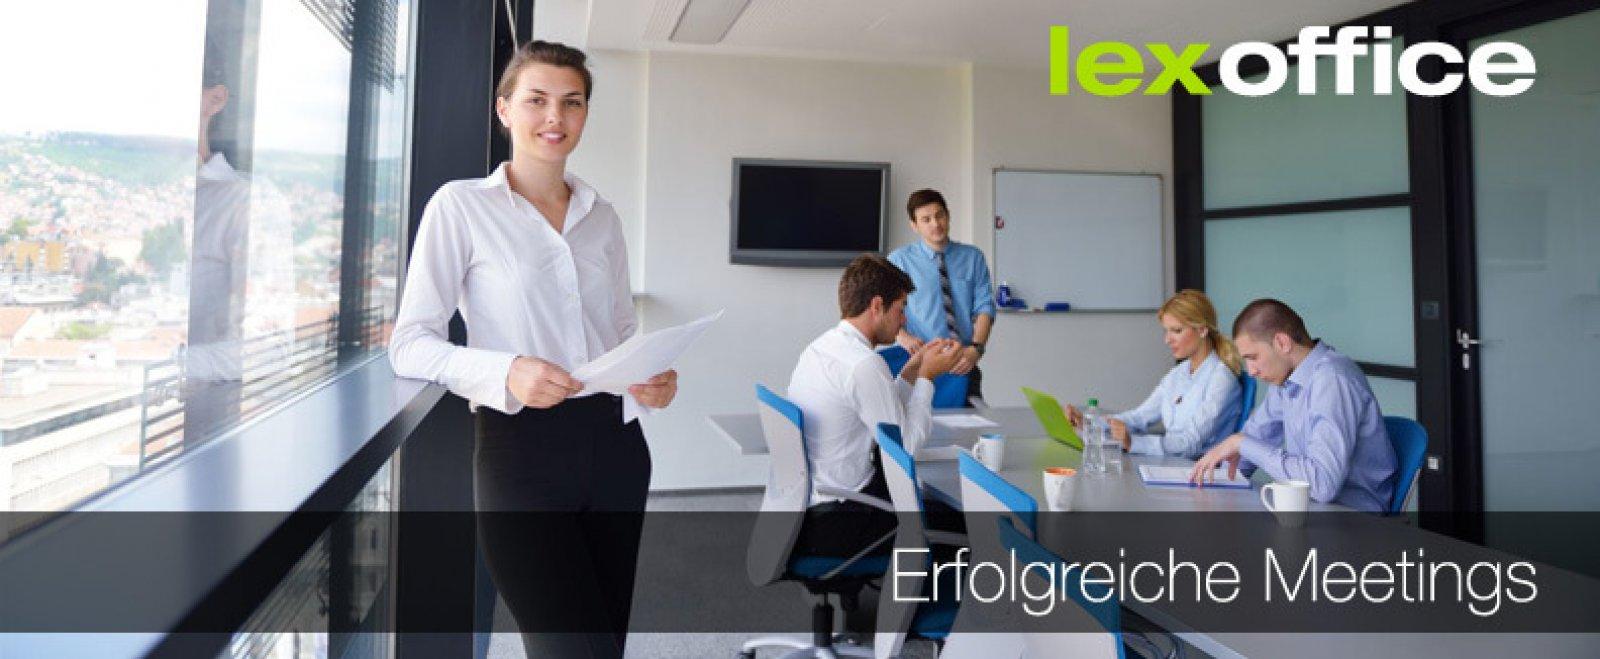 Business Meetings - so werden sie erfolgreich